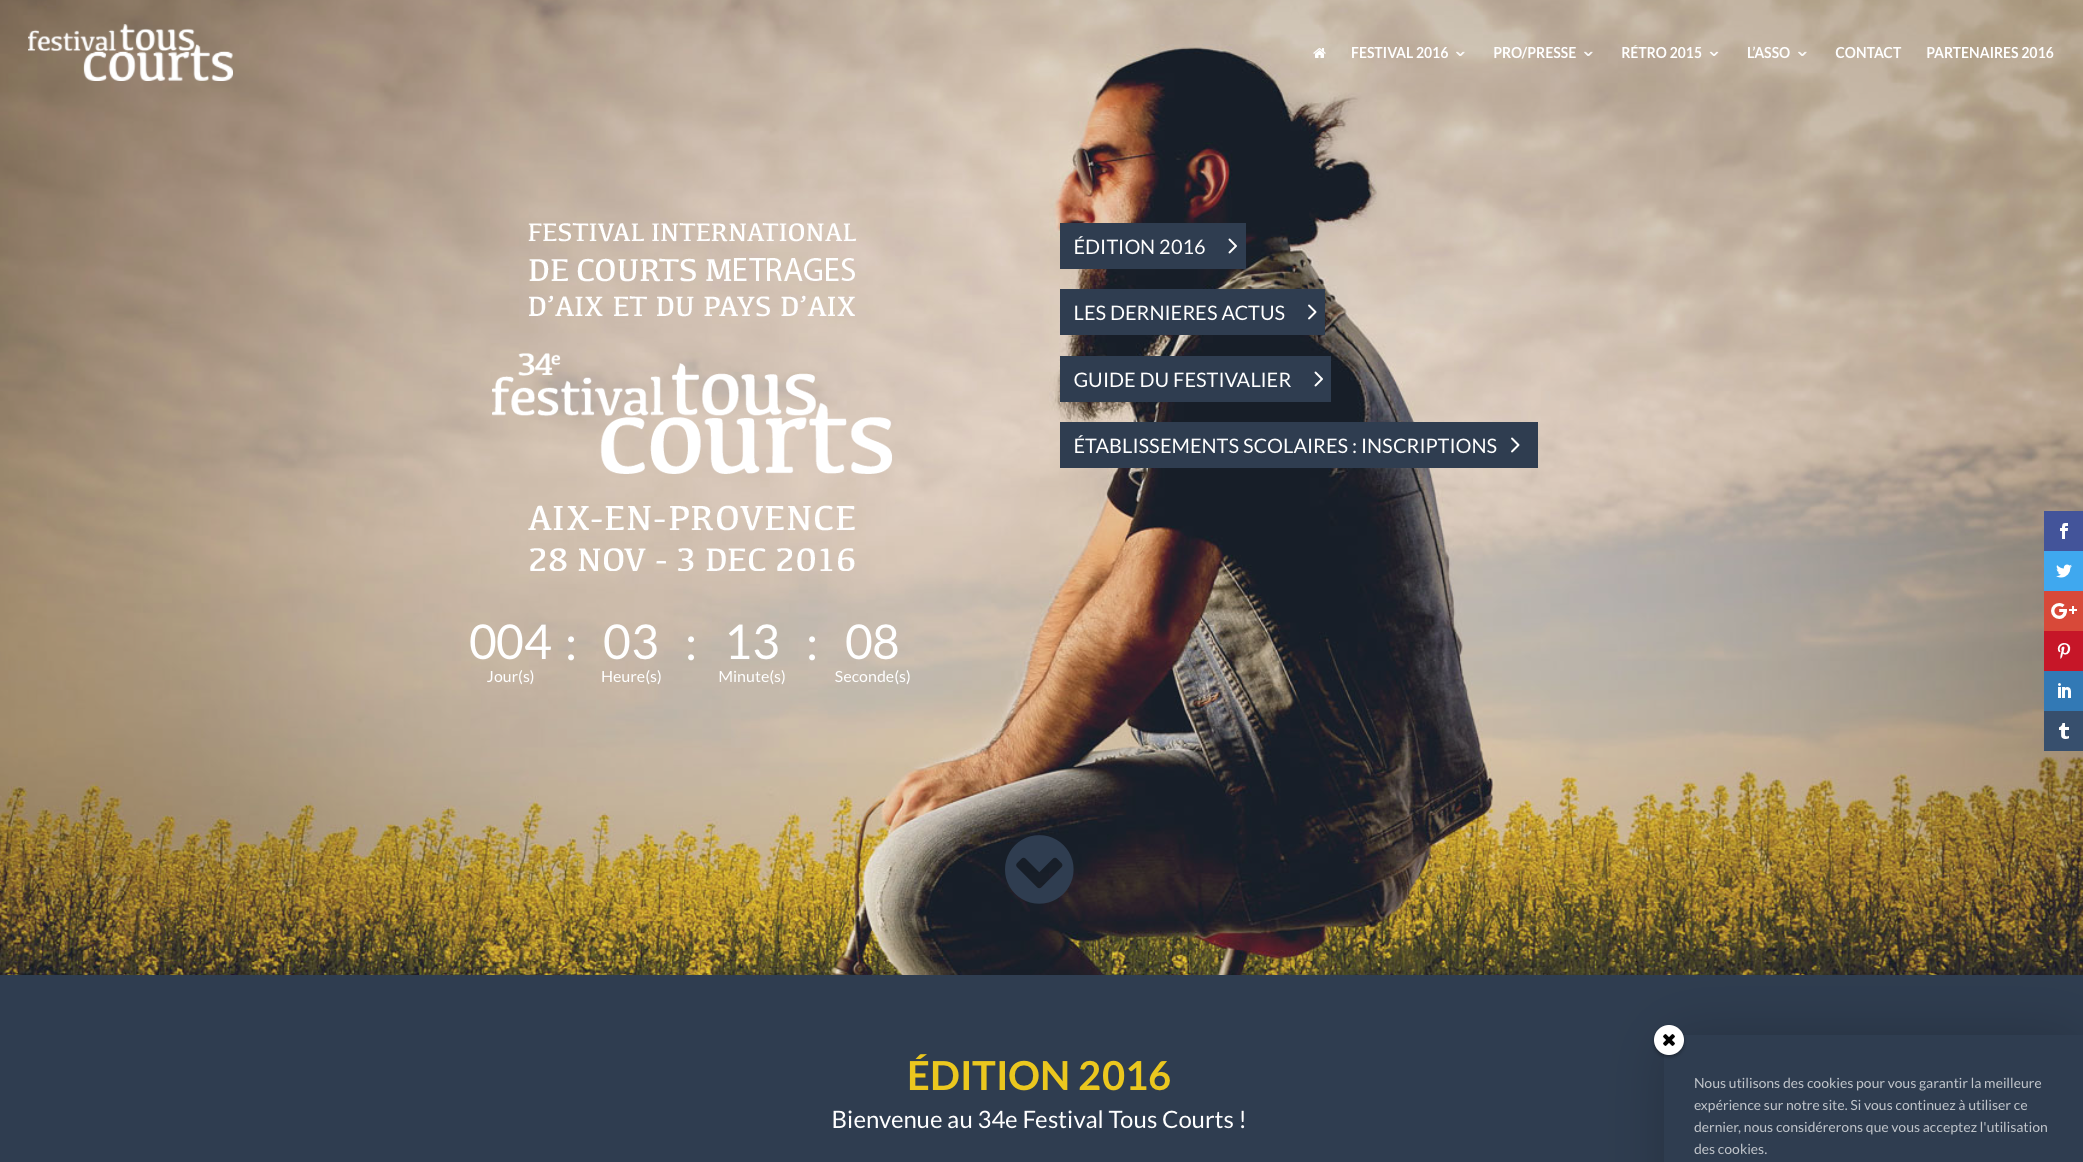 Atenao übersetzt für das Festival Tous Courts